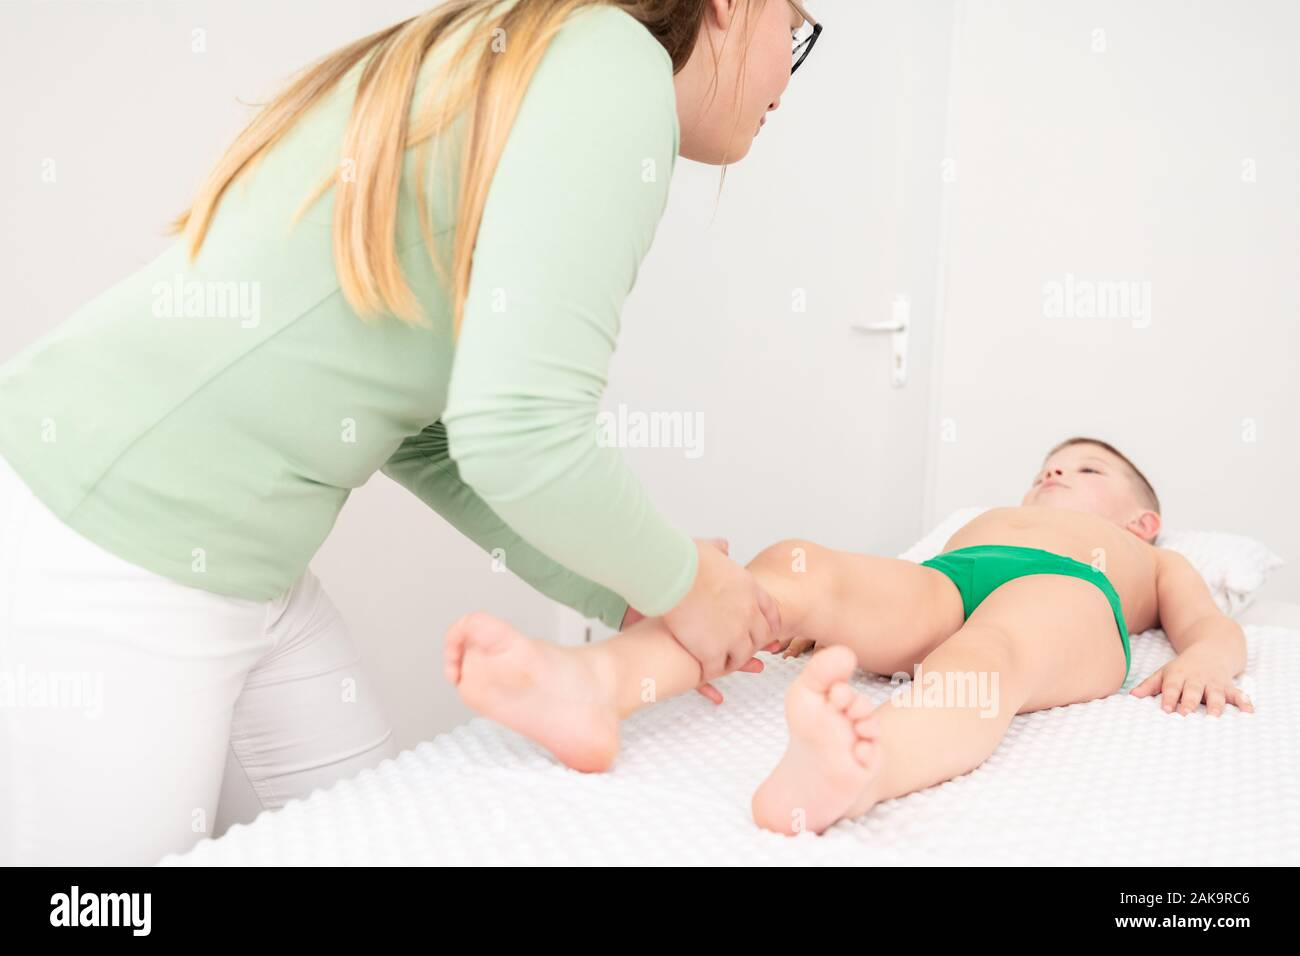 Girls Massaging Boys